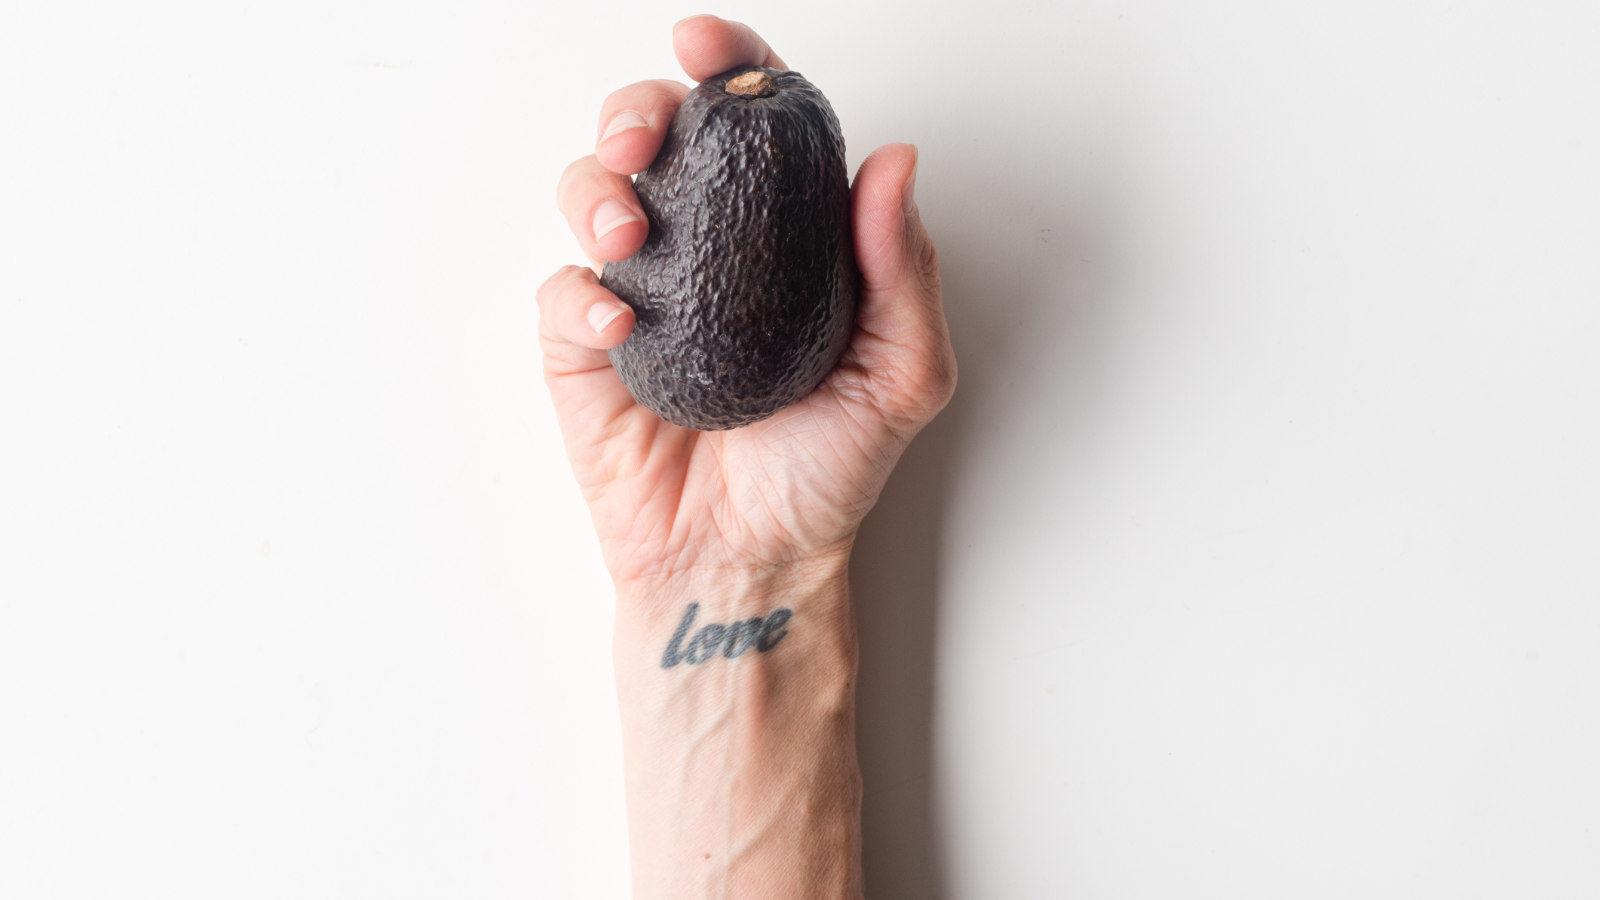 Handgelenk Tattoo Schmerzen